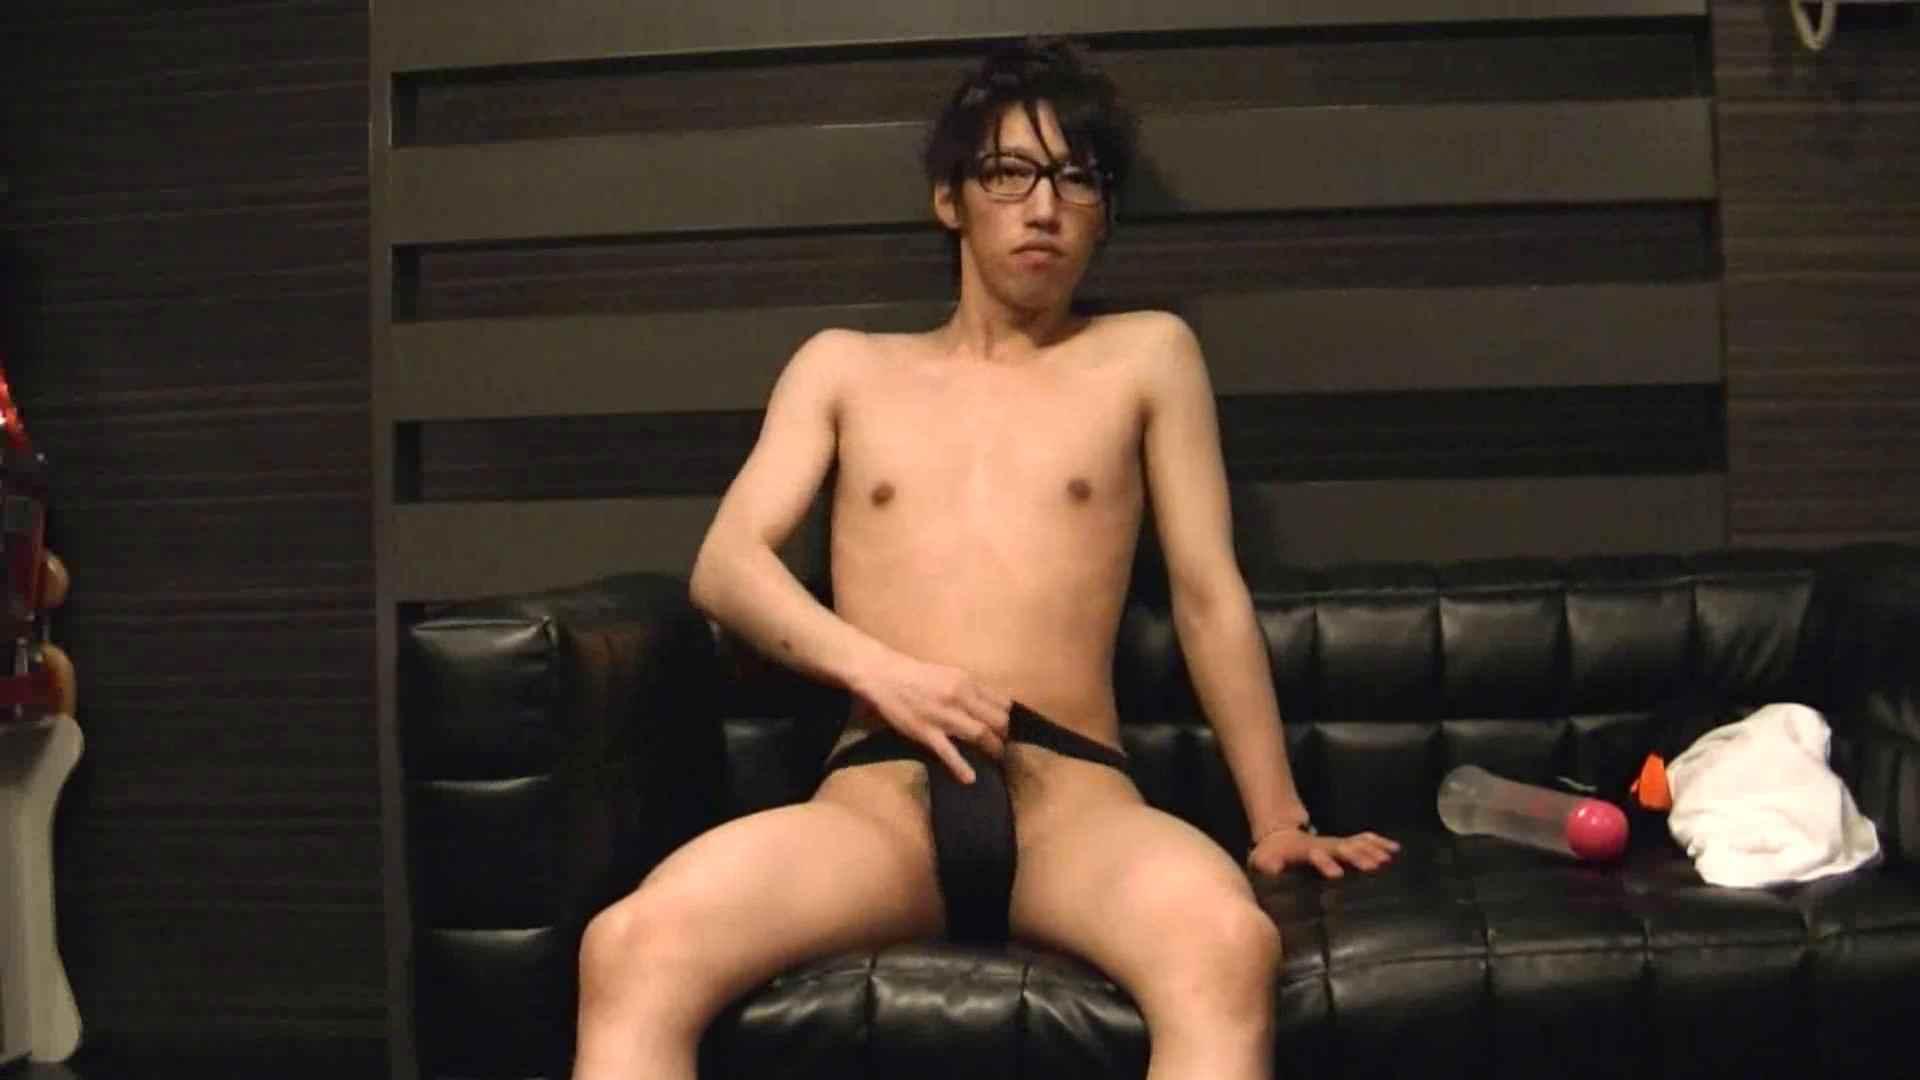 ONA見せカーニバル!! Vol3 男  93pic 25